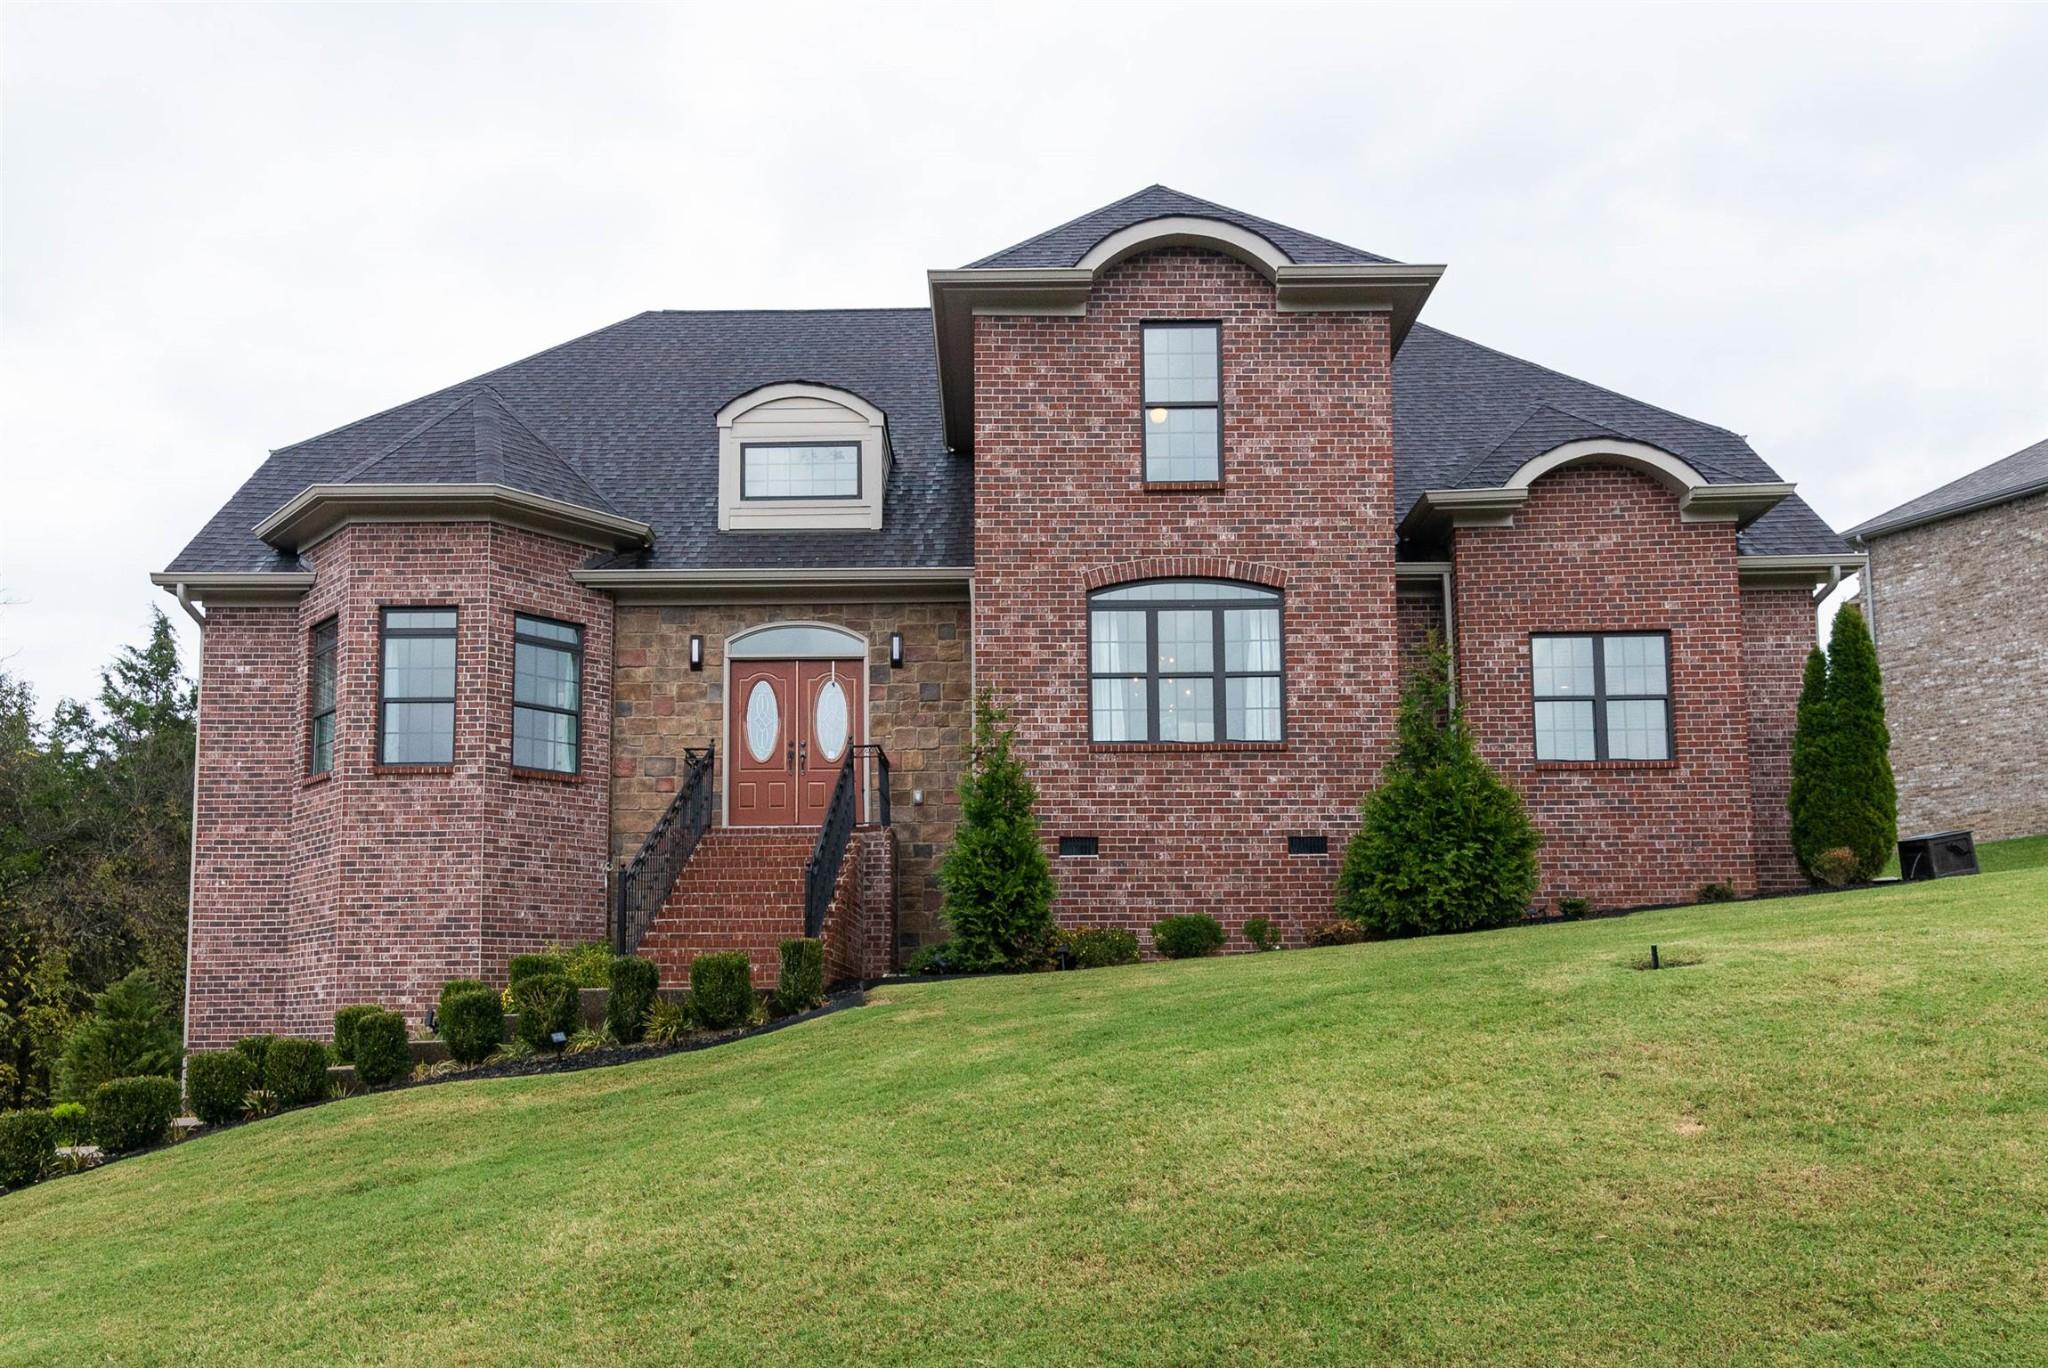 100 Copper Creek Dr, Goodlettsville, TN 37072 - Goodlettsville, TN real estate listing